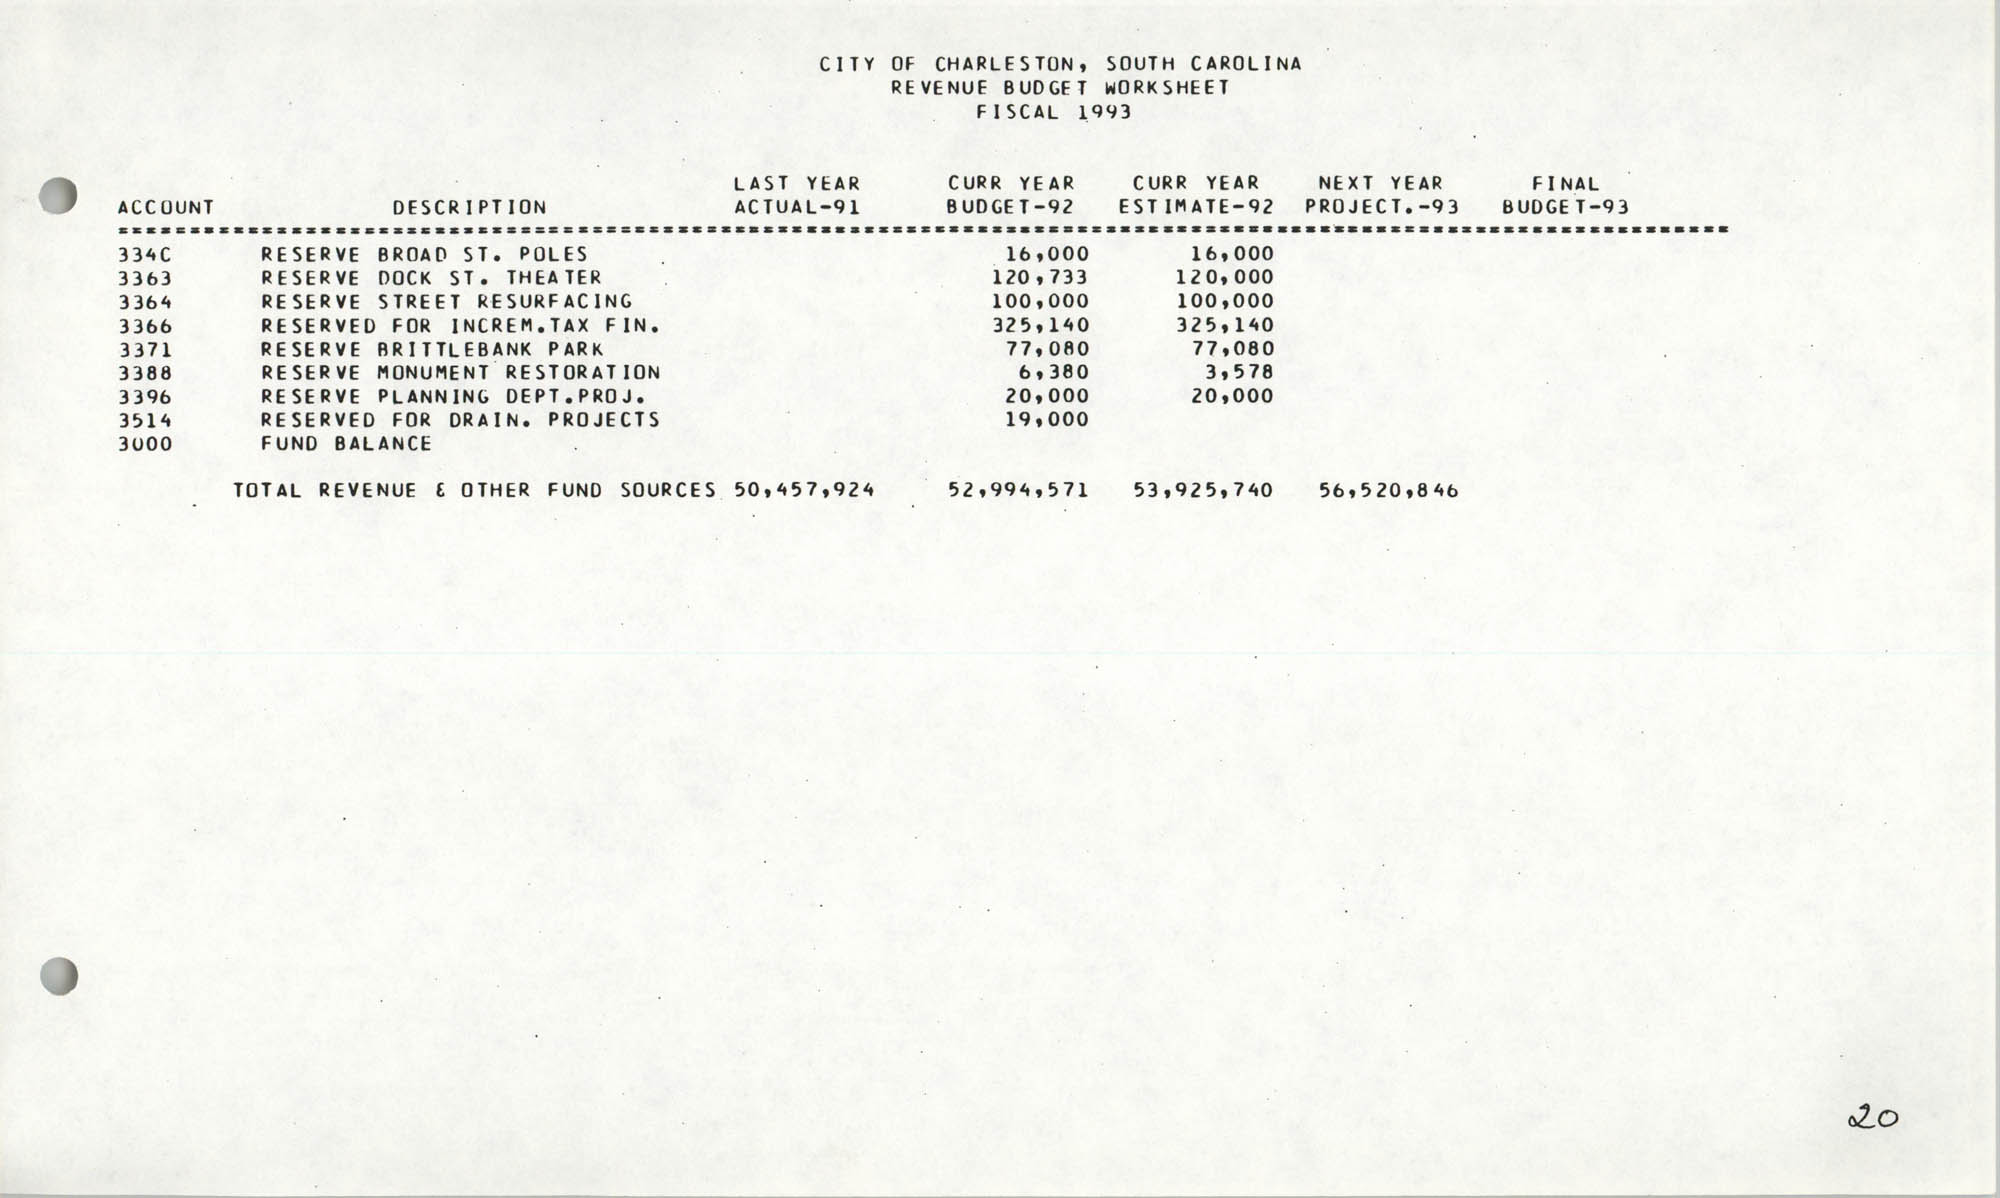 The City Council of Charleston, South Carolina, 1993 Budget, Page 20